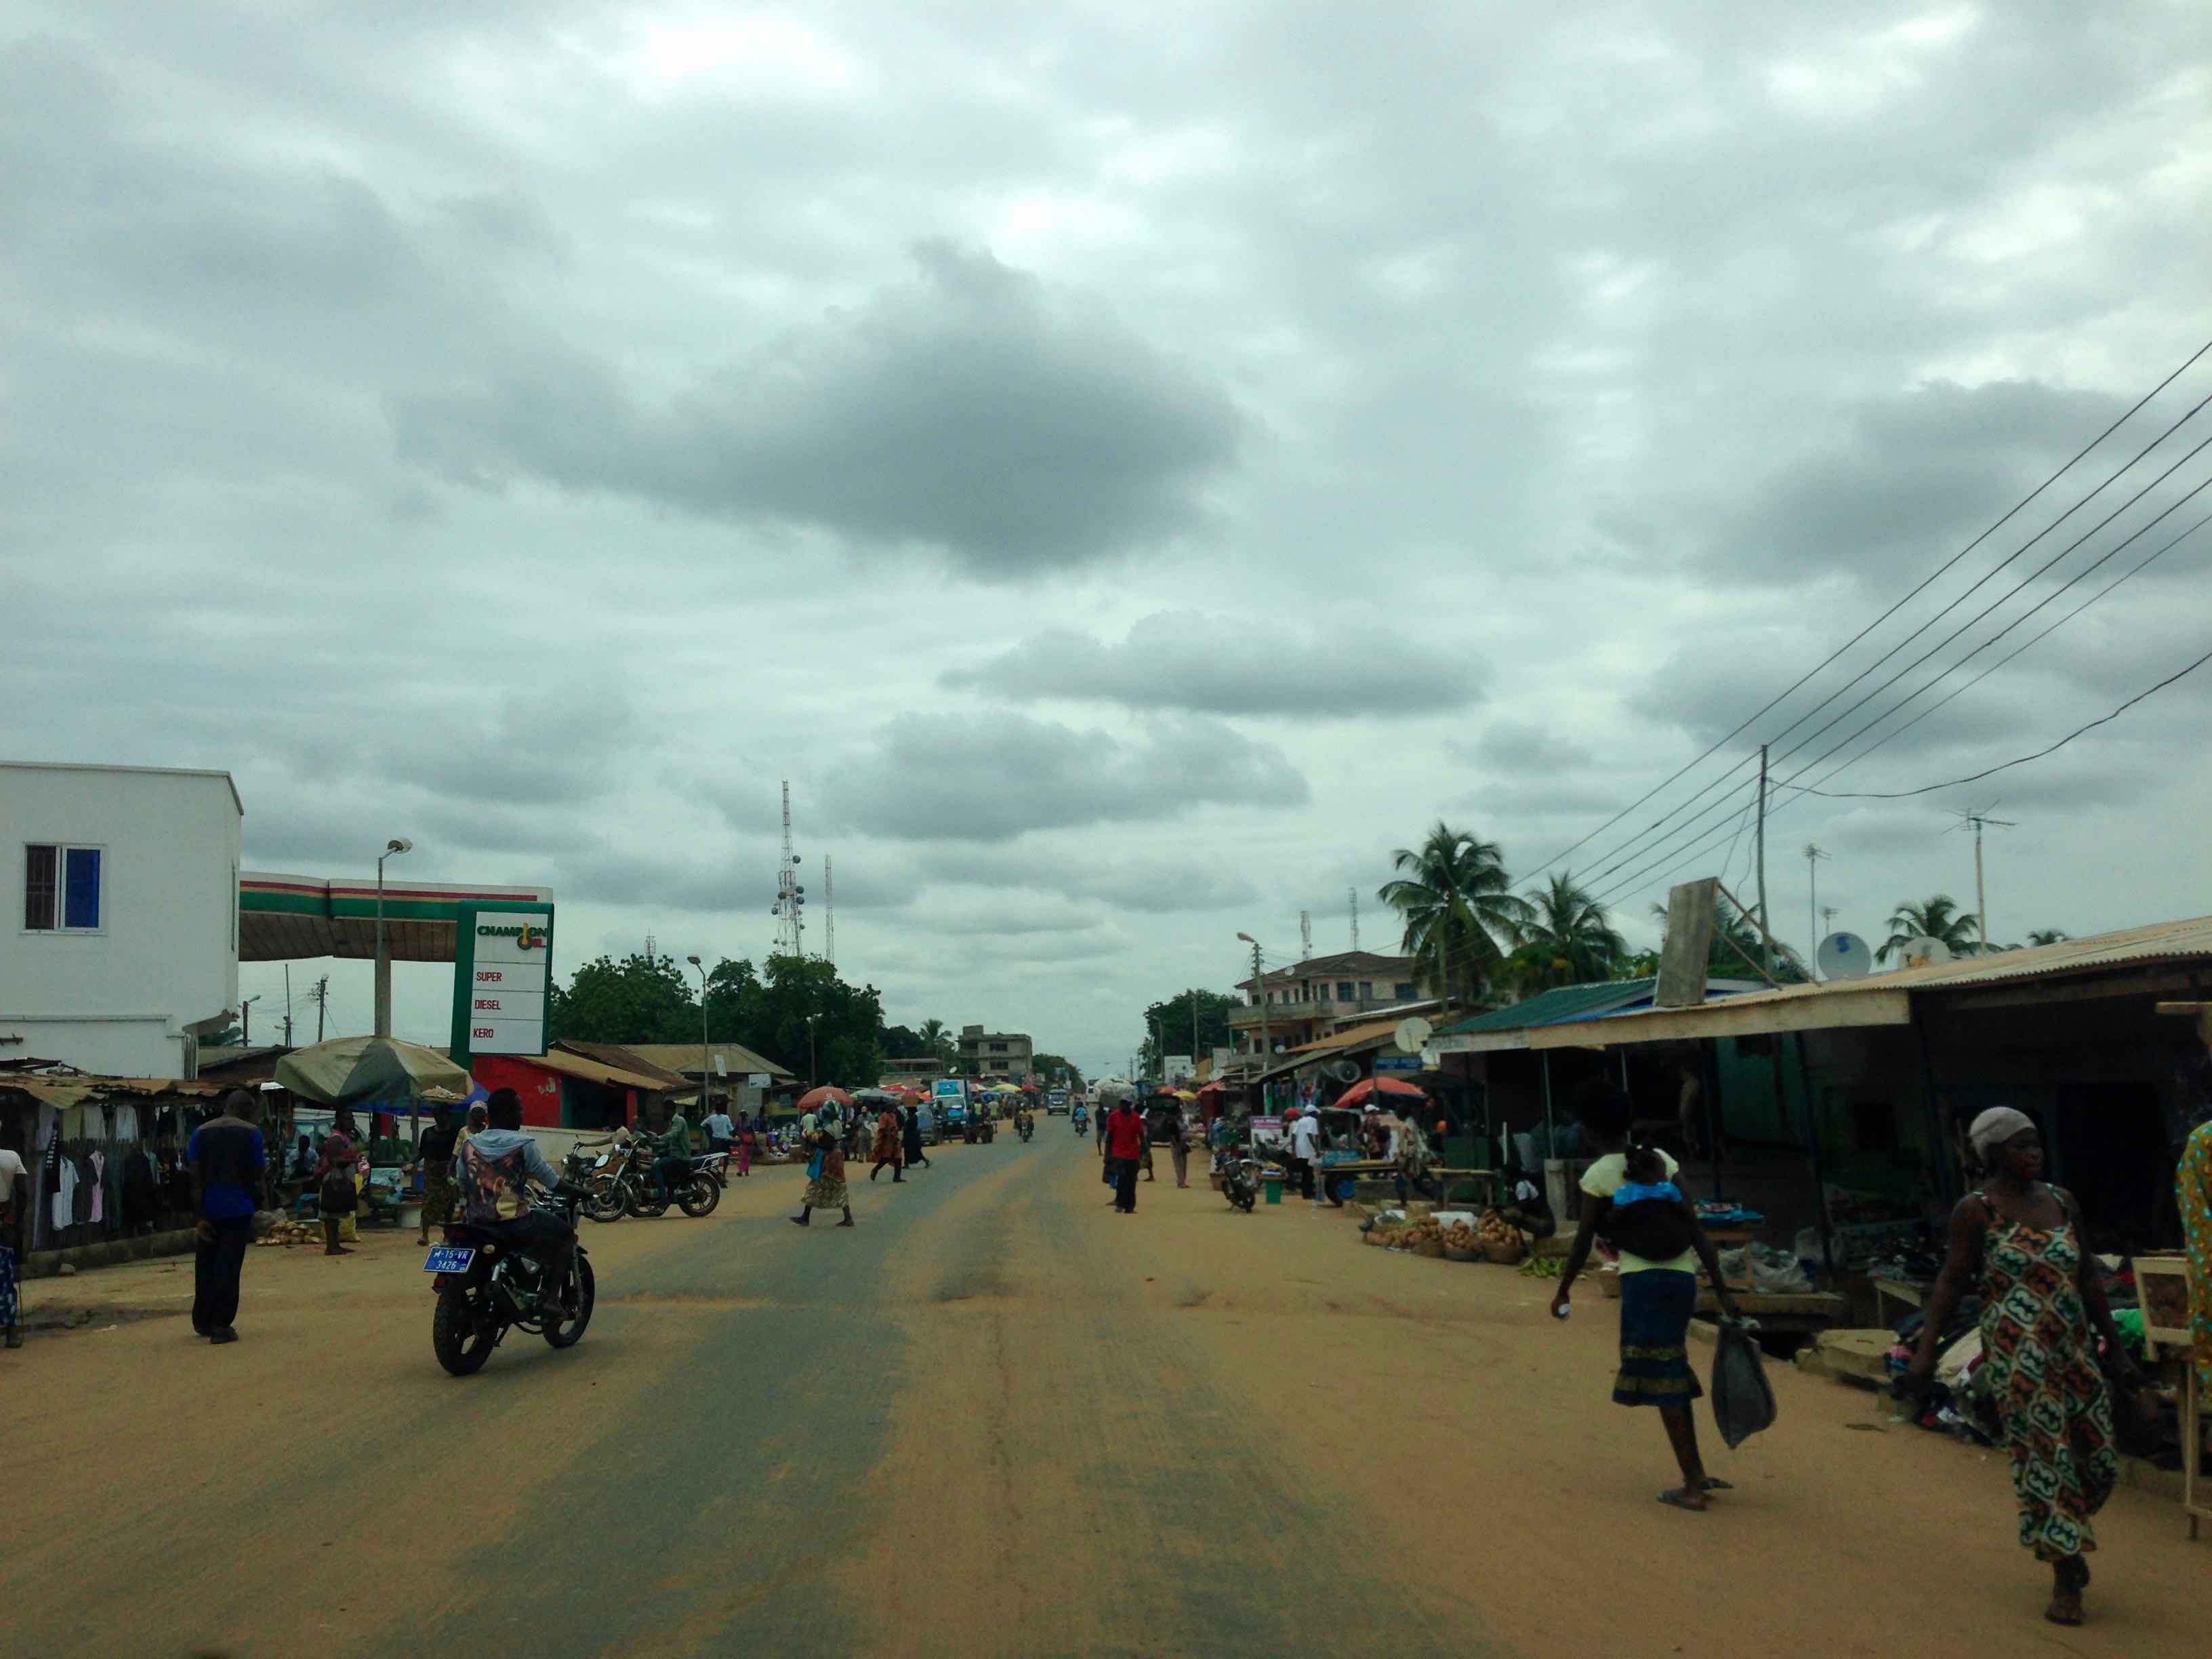 Aflao, Volta, Ghana. #JujuFilms